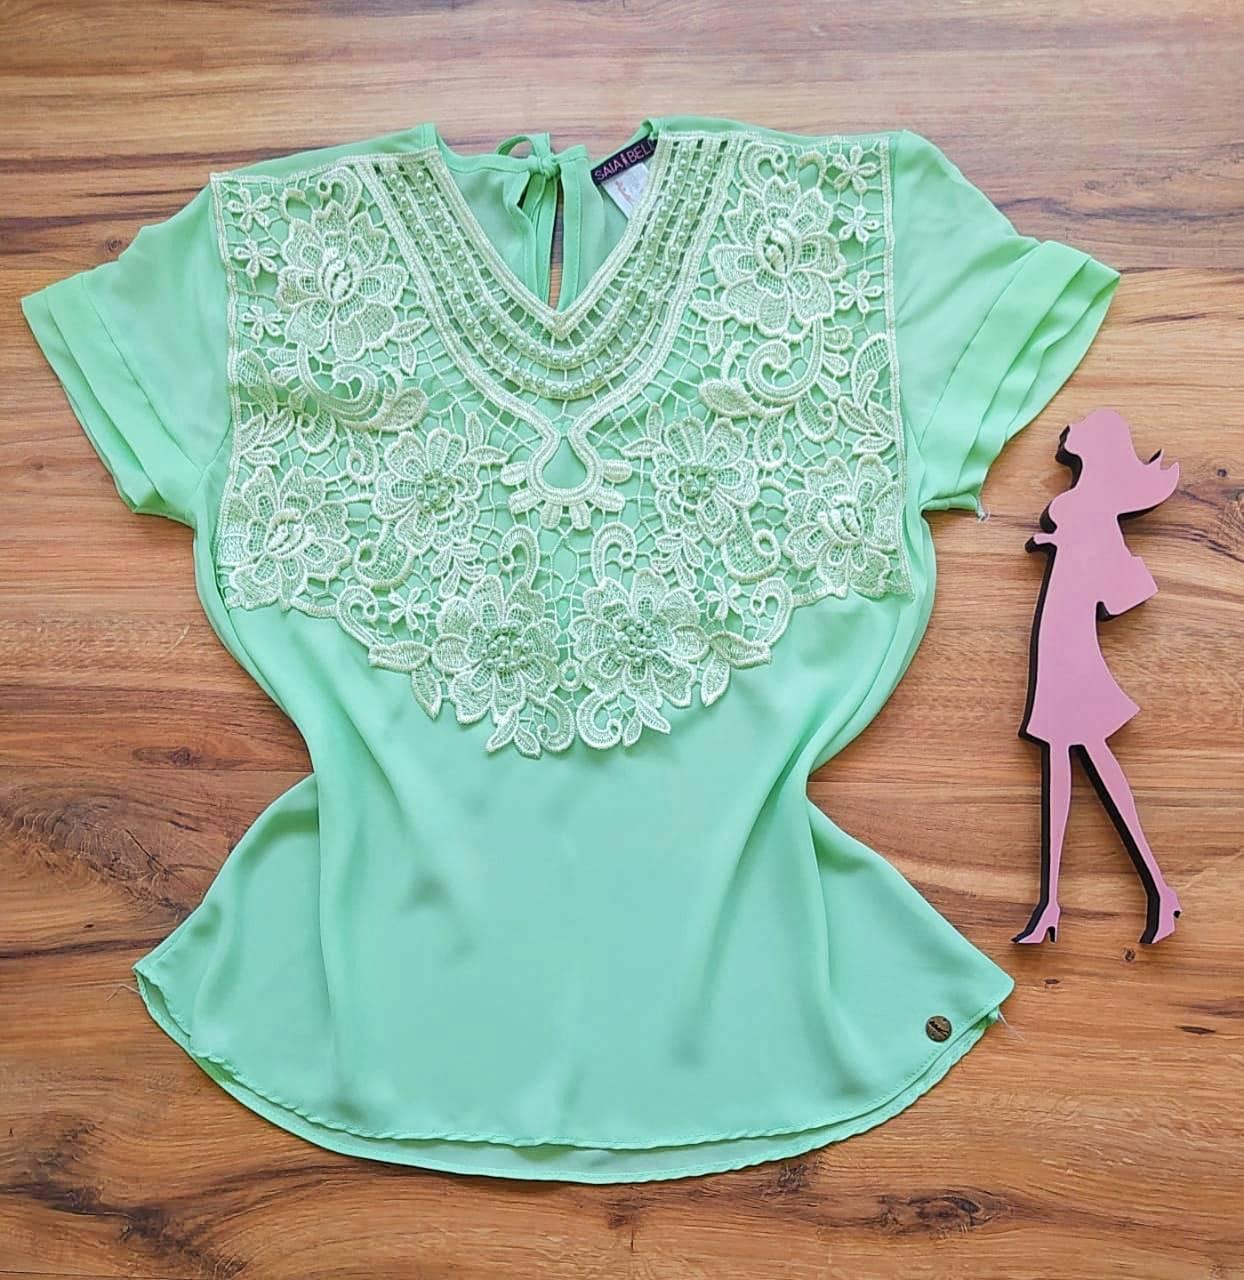 Blusa Karina de Renda Saia Bella - SB79905 Verde Claro